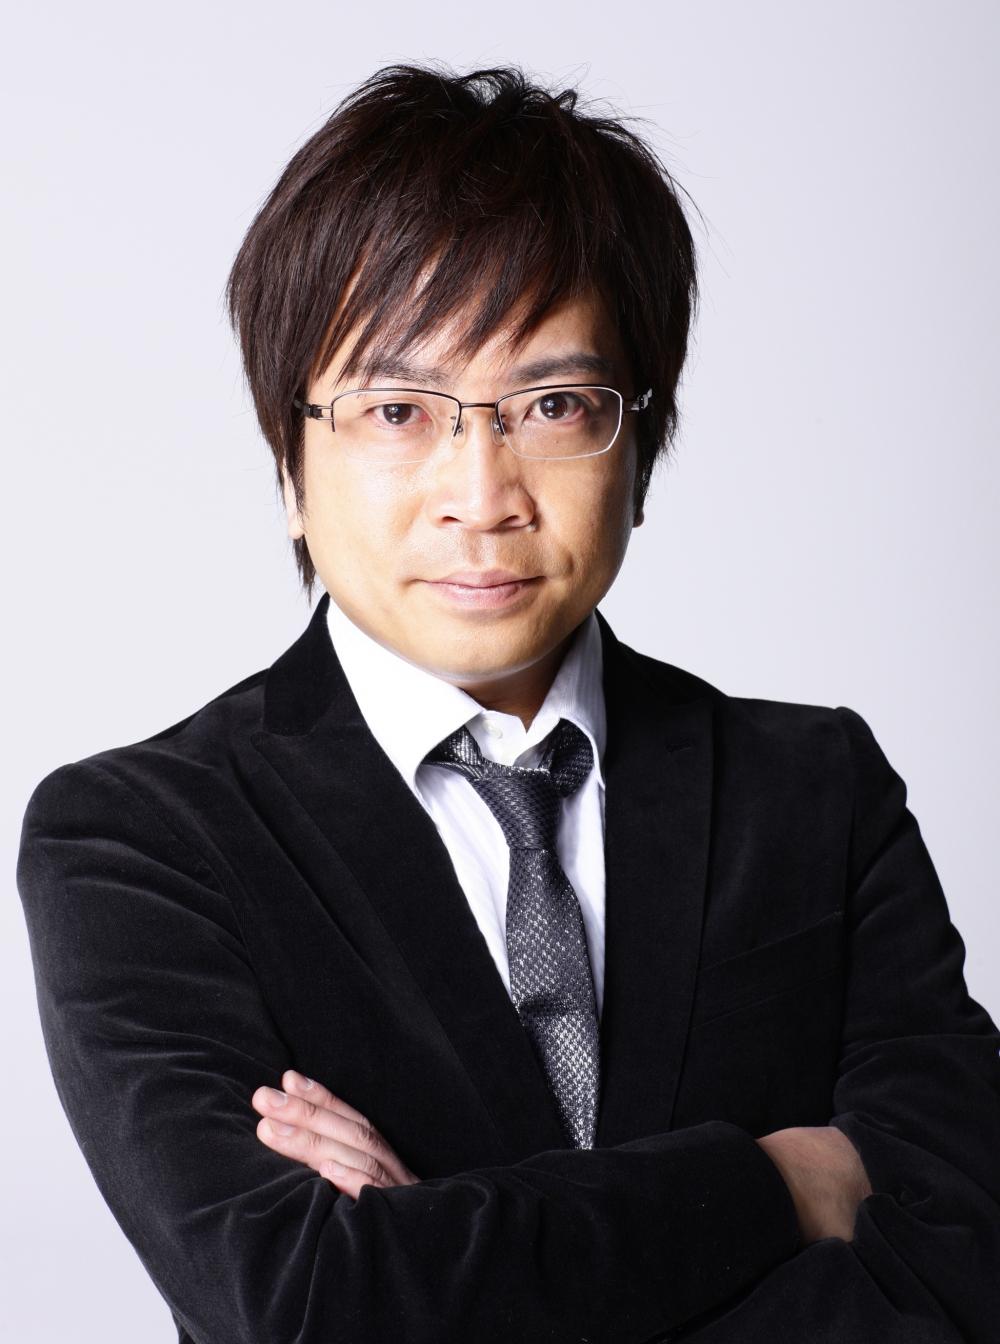 File:KunihiroKawamoto.png